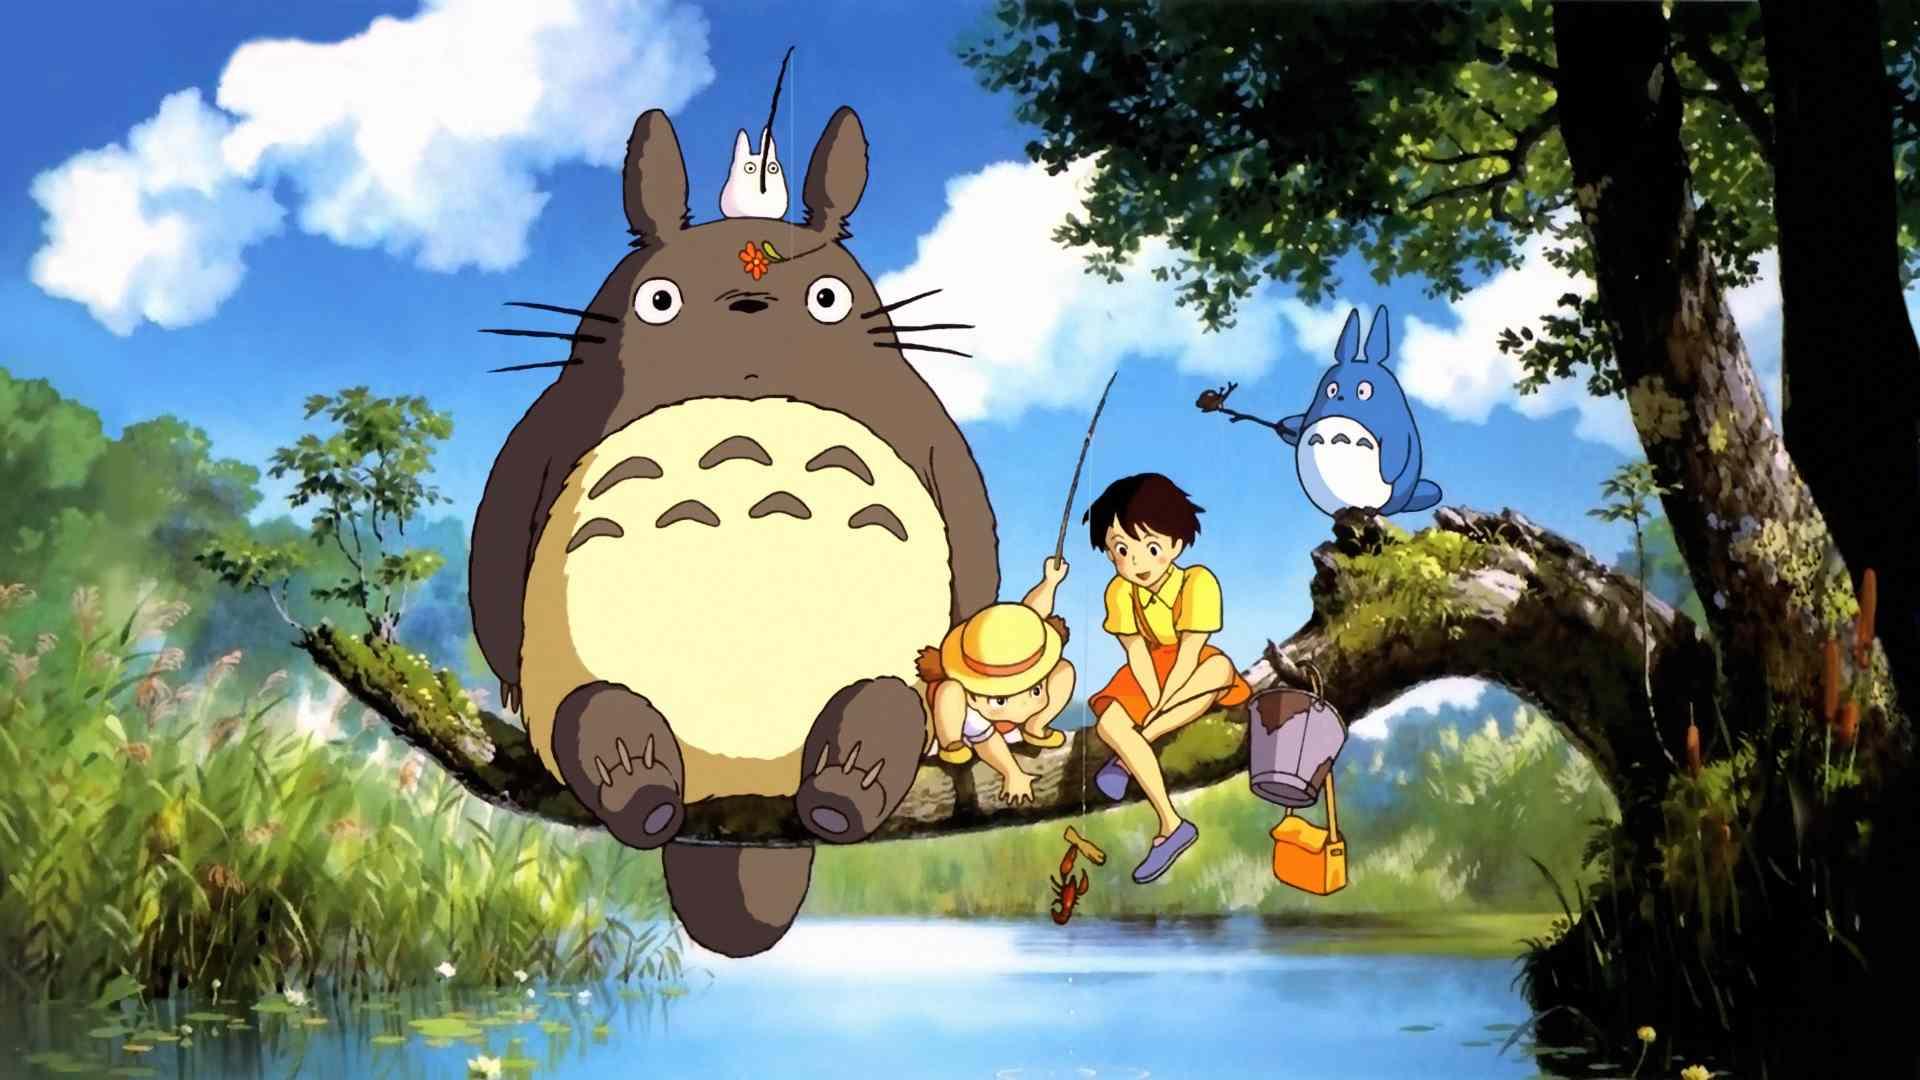 Hayao Miyazaki anime will host Evangelion creator